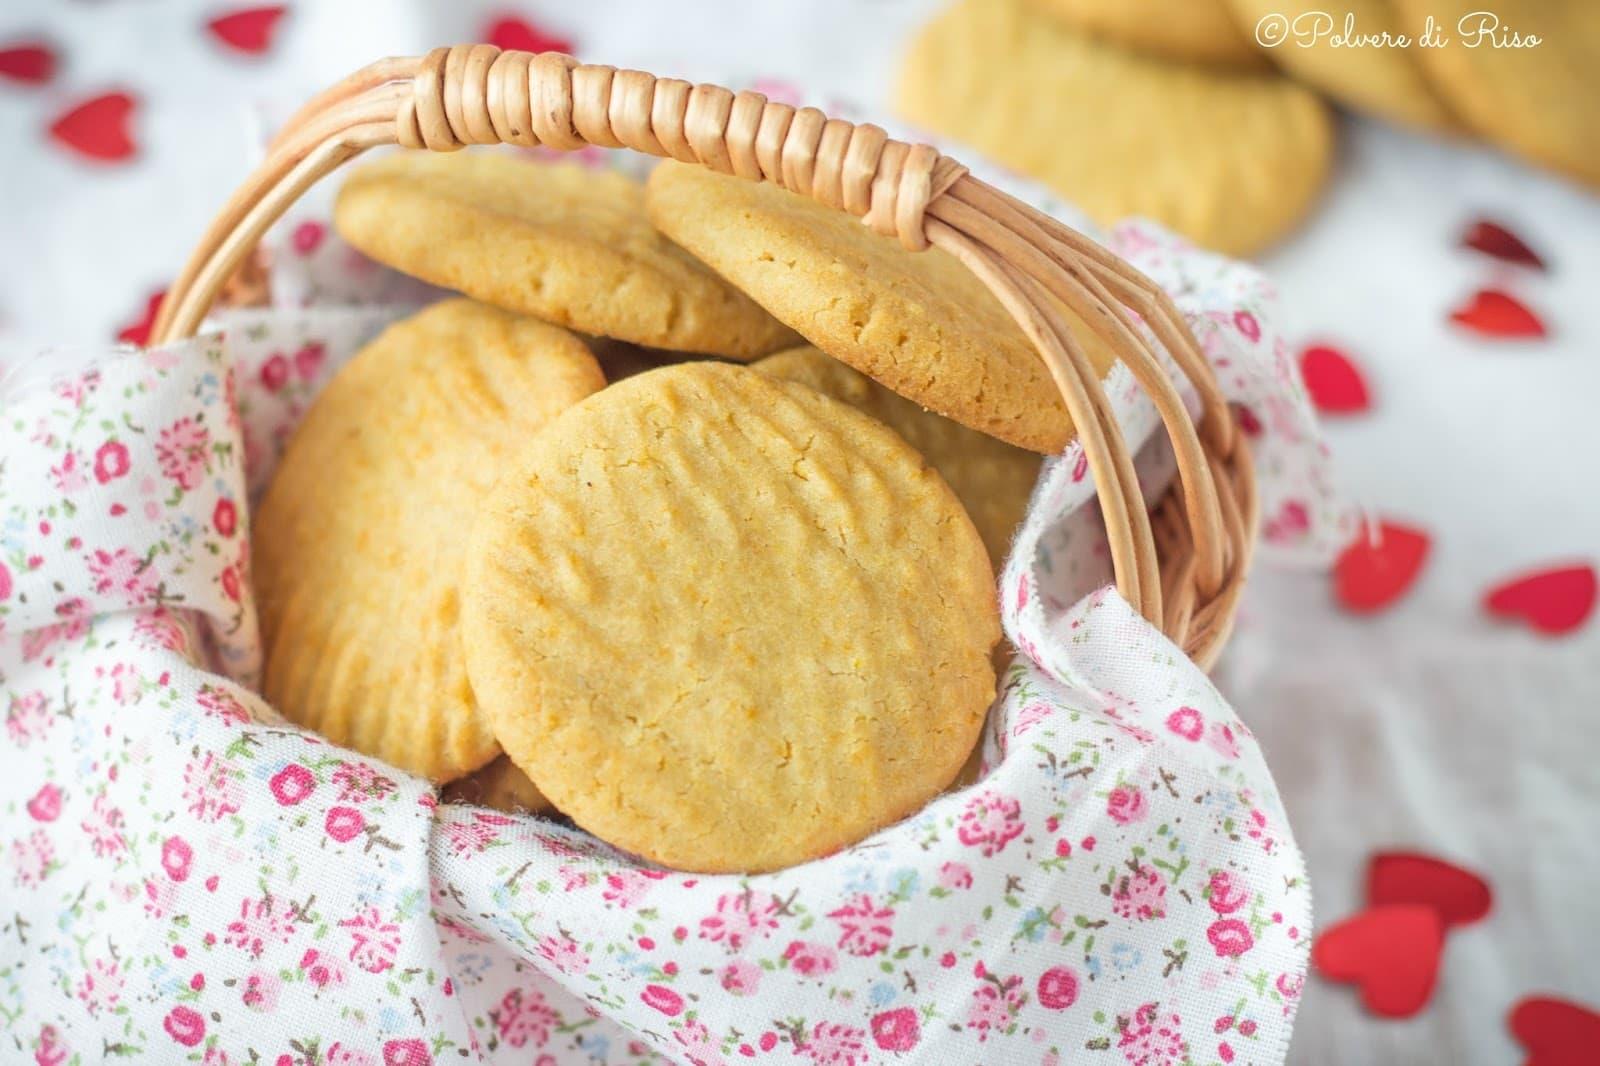 biscotti senza glutine e zucchero